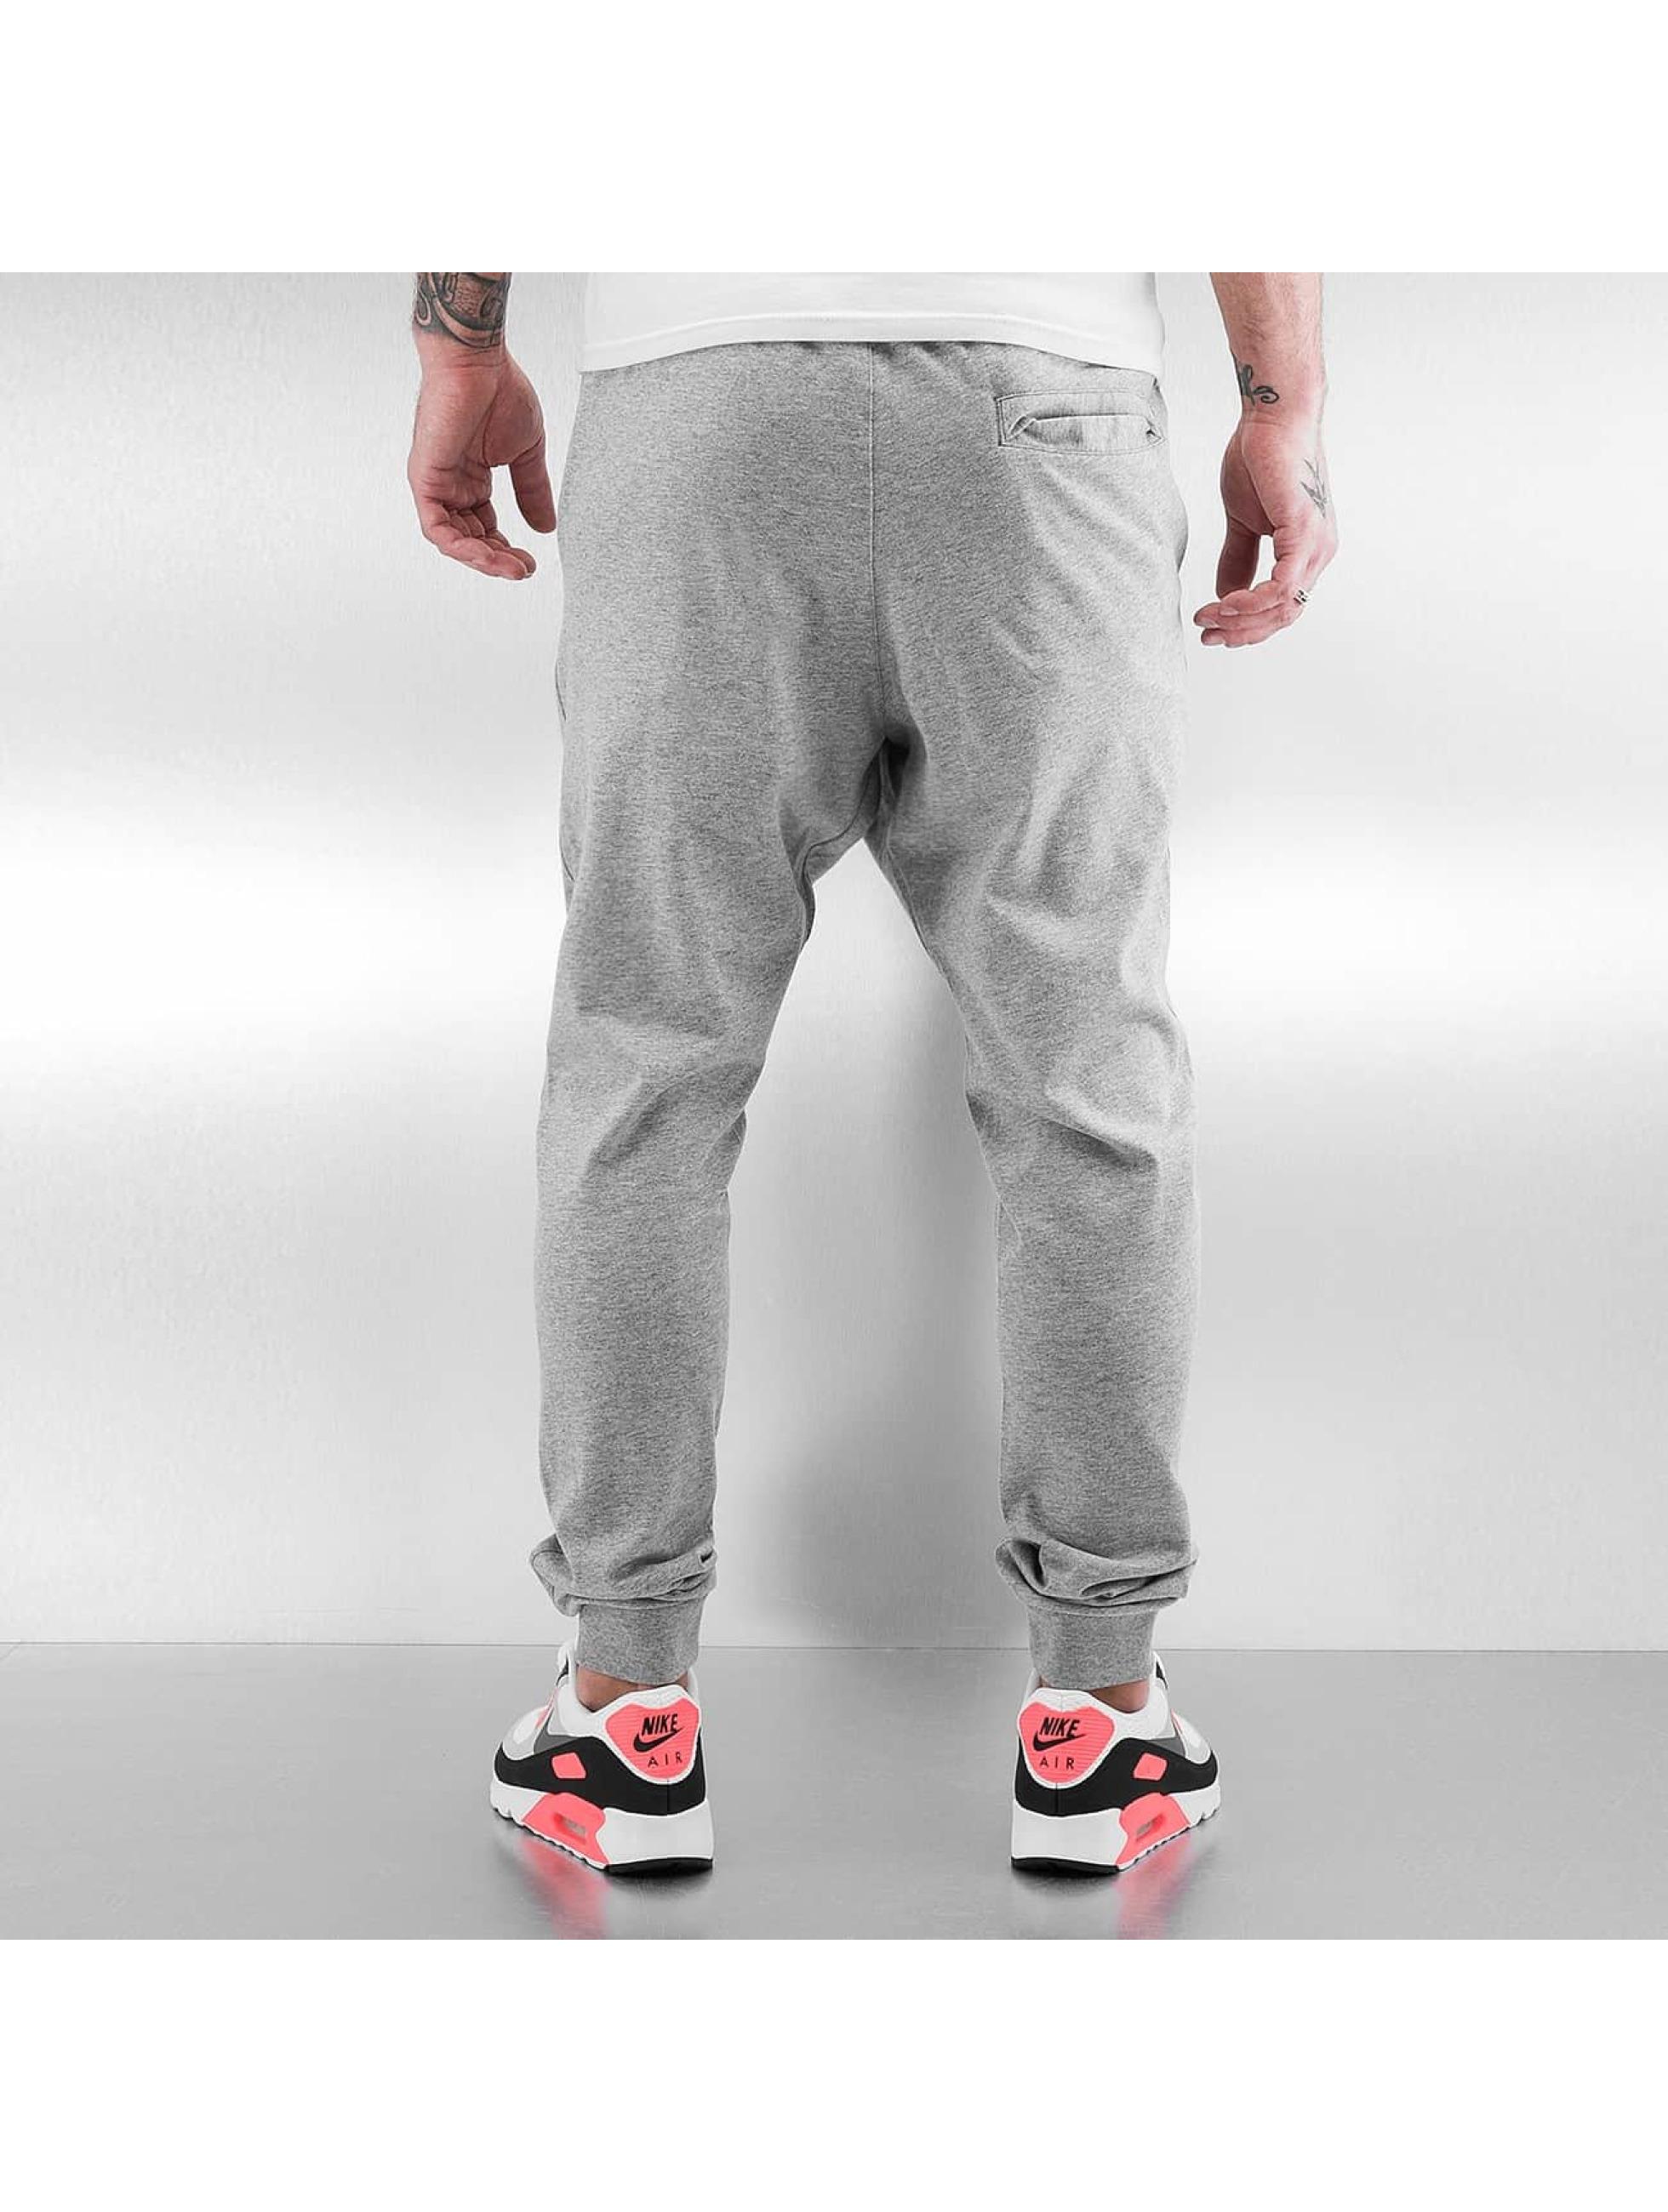 Nike tepláky Sportswear šedá